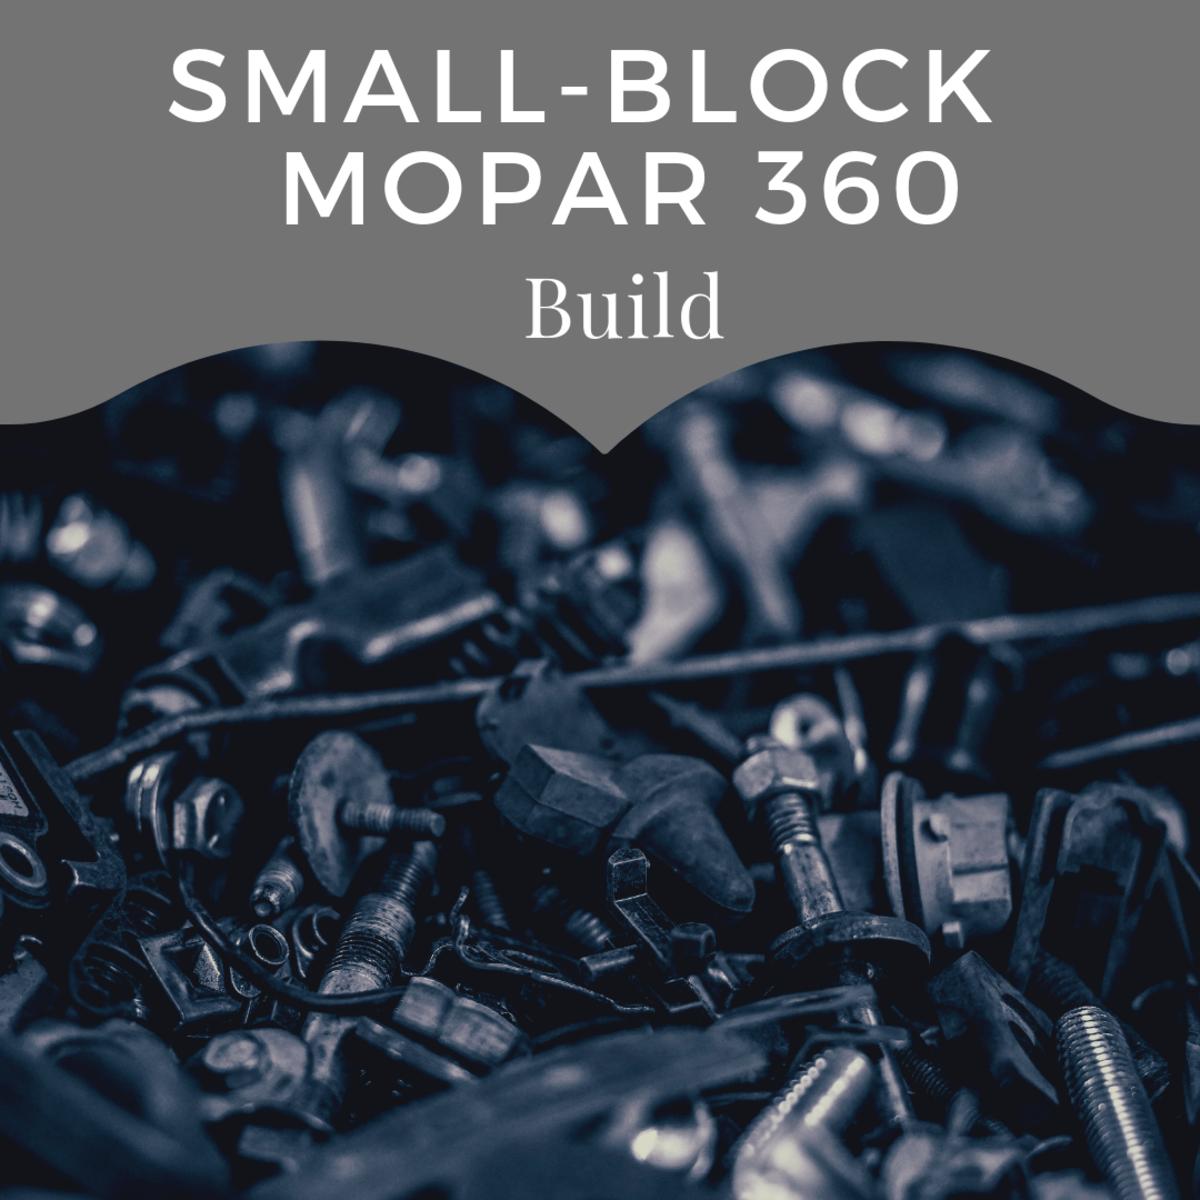 Build a Hot-Running Mopar 360 for Street and Strip